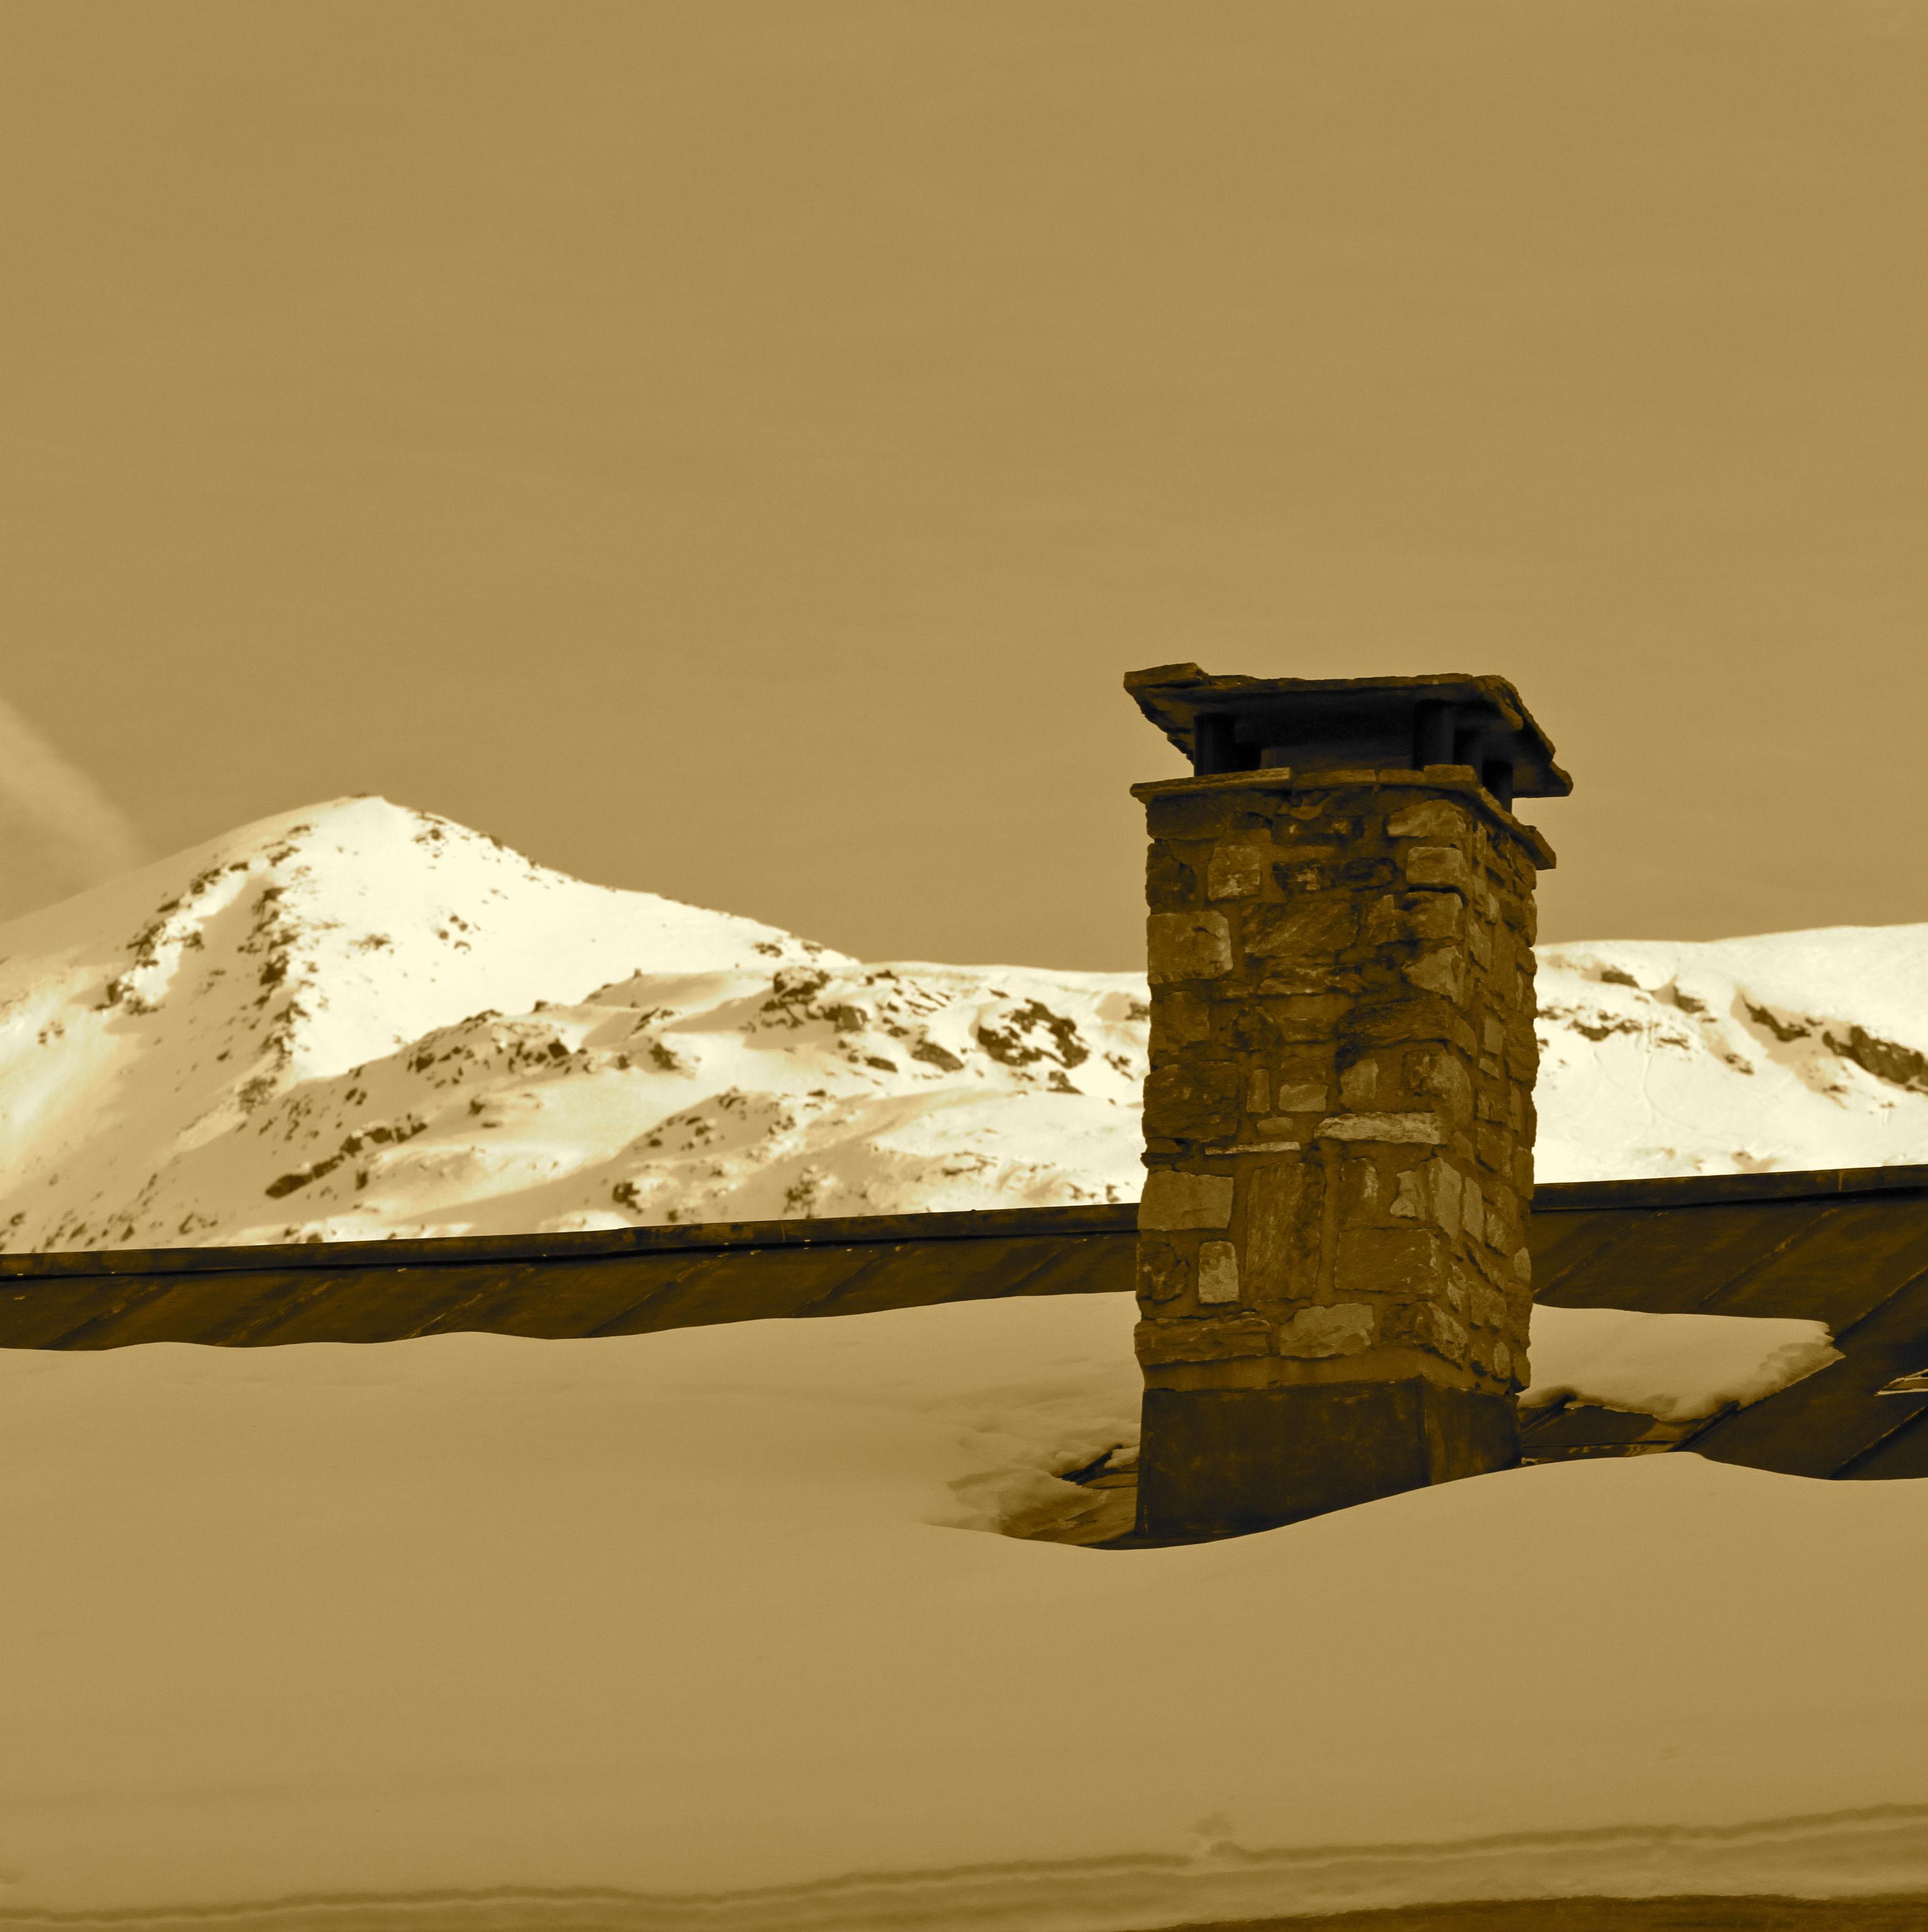 Val d'Isere #France #Skiing #ValdIsere